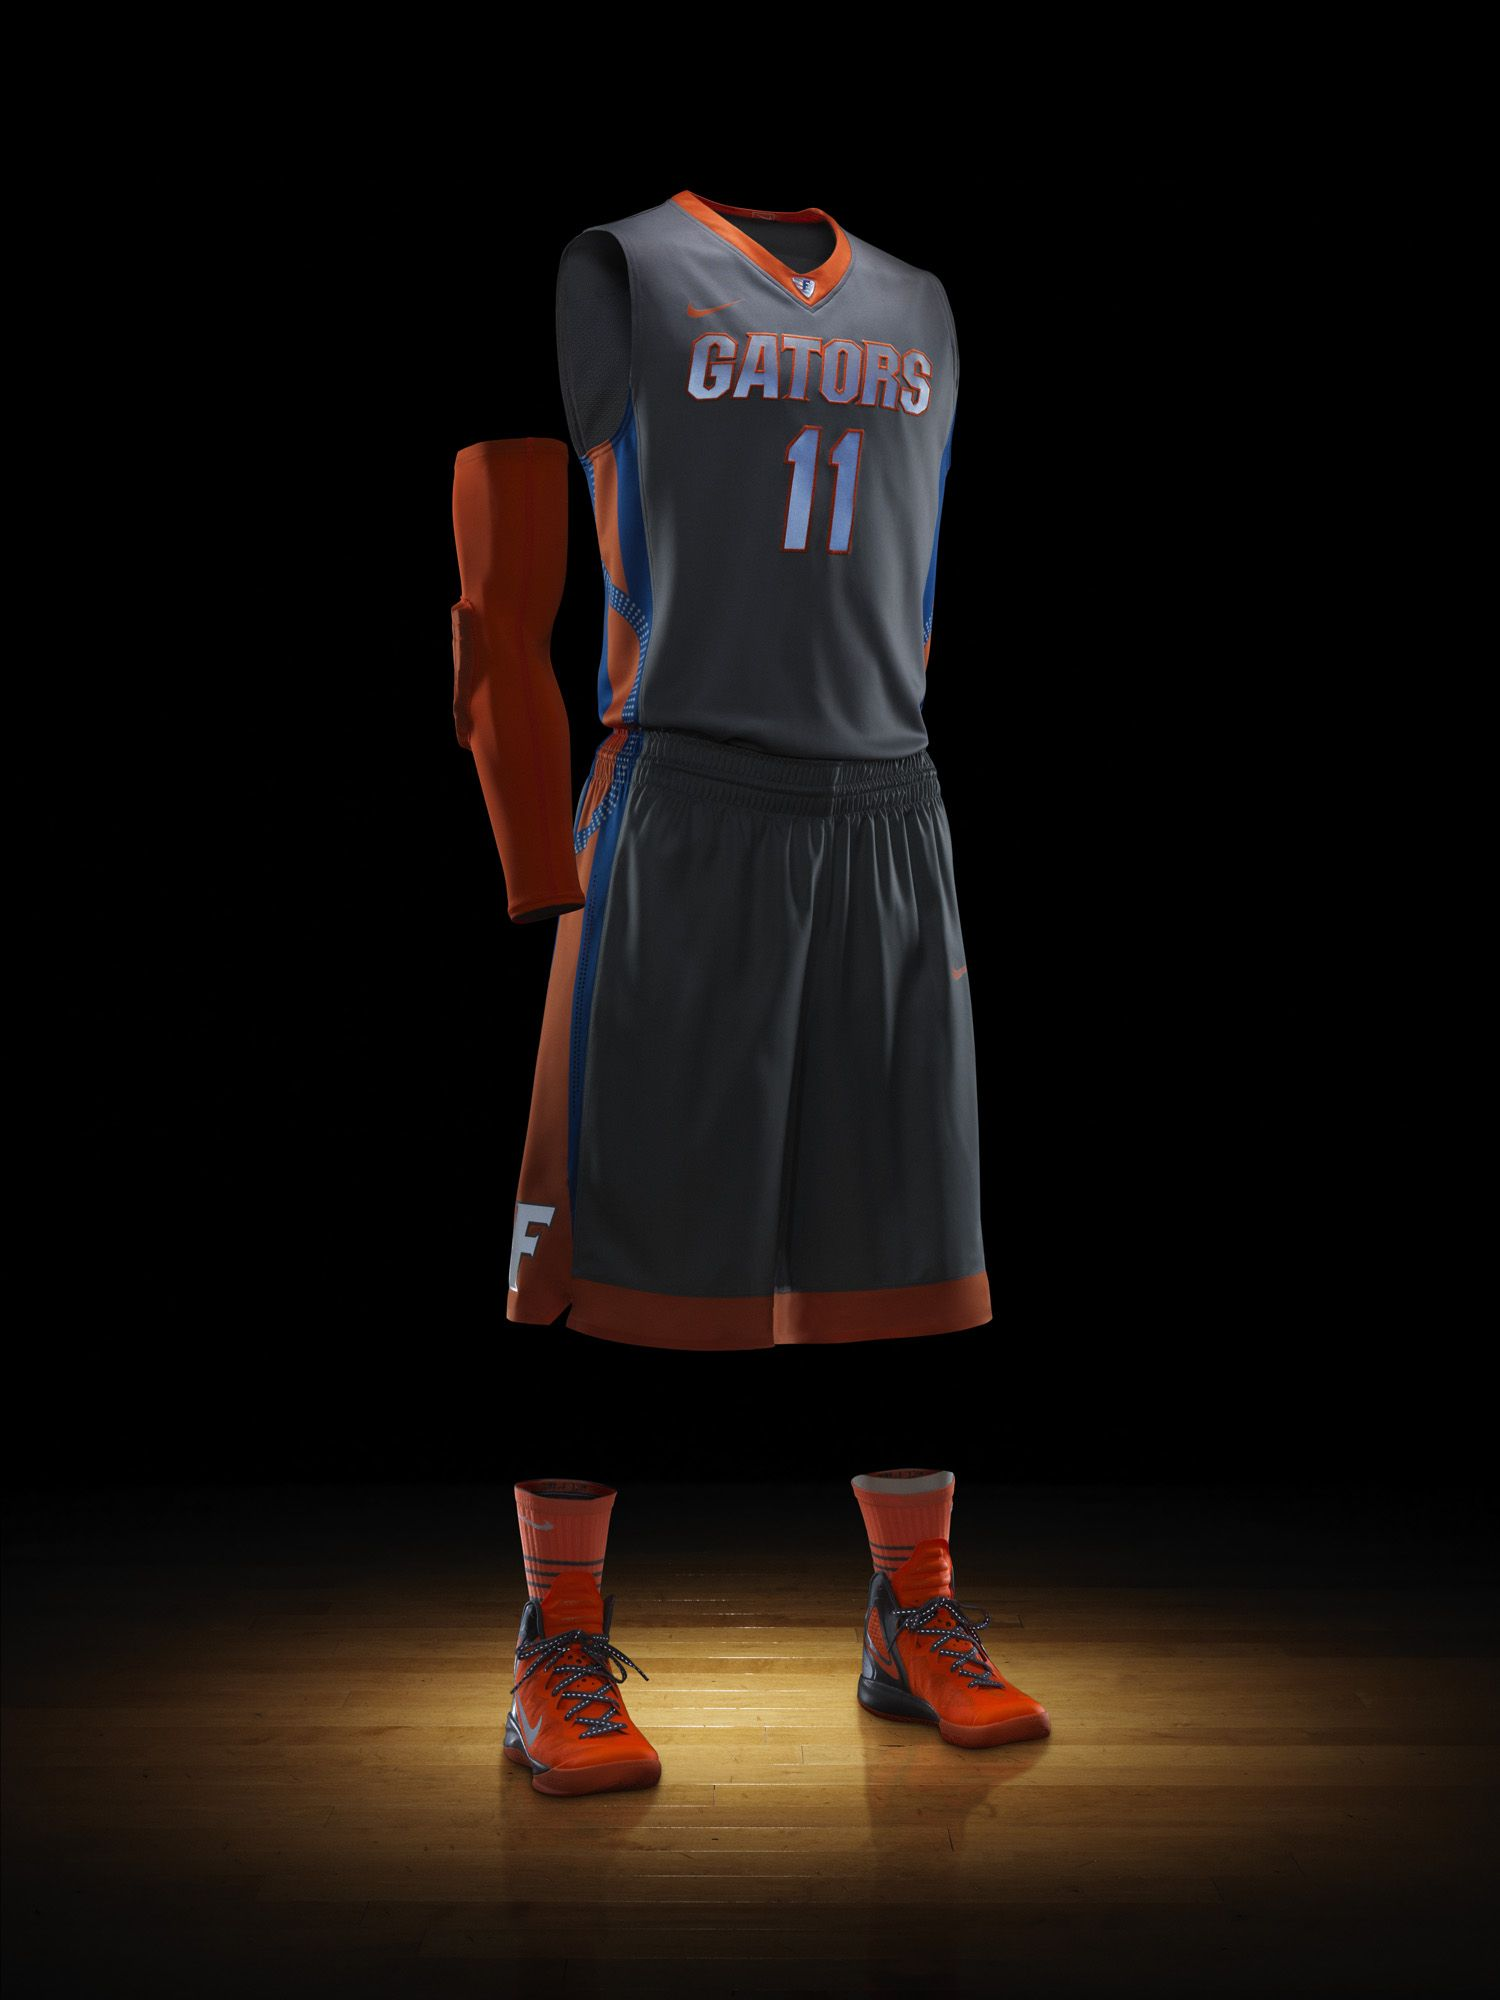 newest 974f4 65b9f Florida to wear Nike Hyper Elite Platinum uniforms | ONLY ...